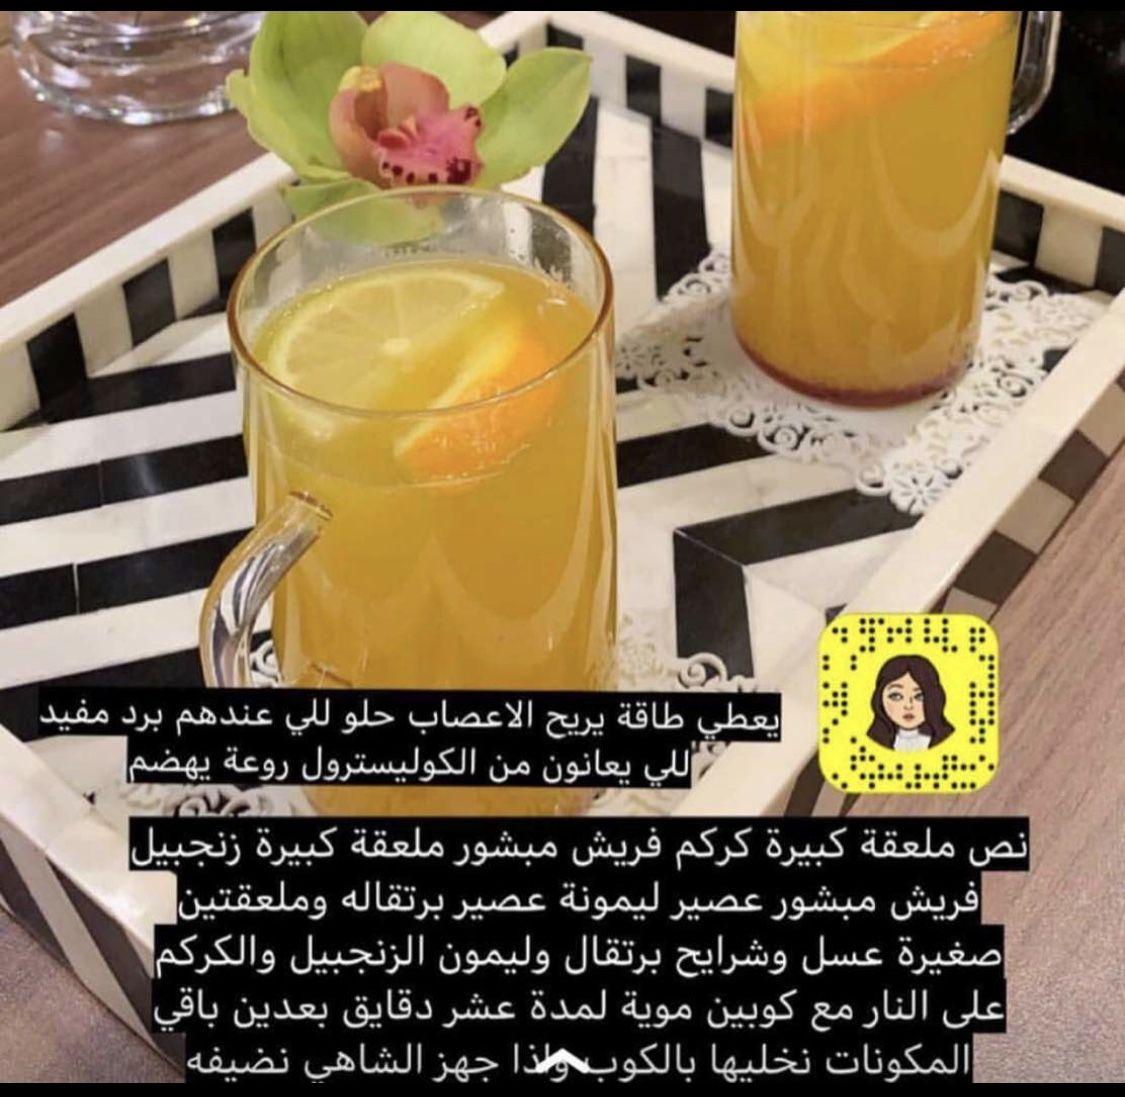 Pin By 050550560570 On خخخ Food Hacks Arabic Food Food And Drink